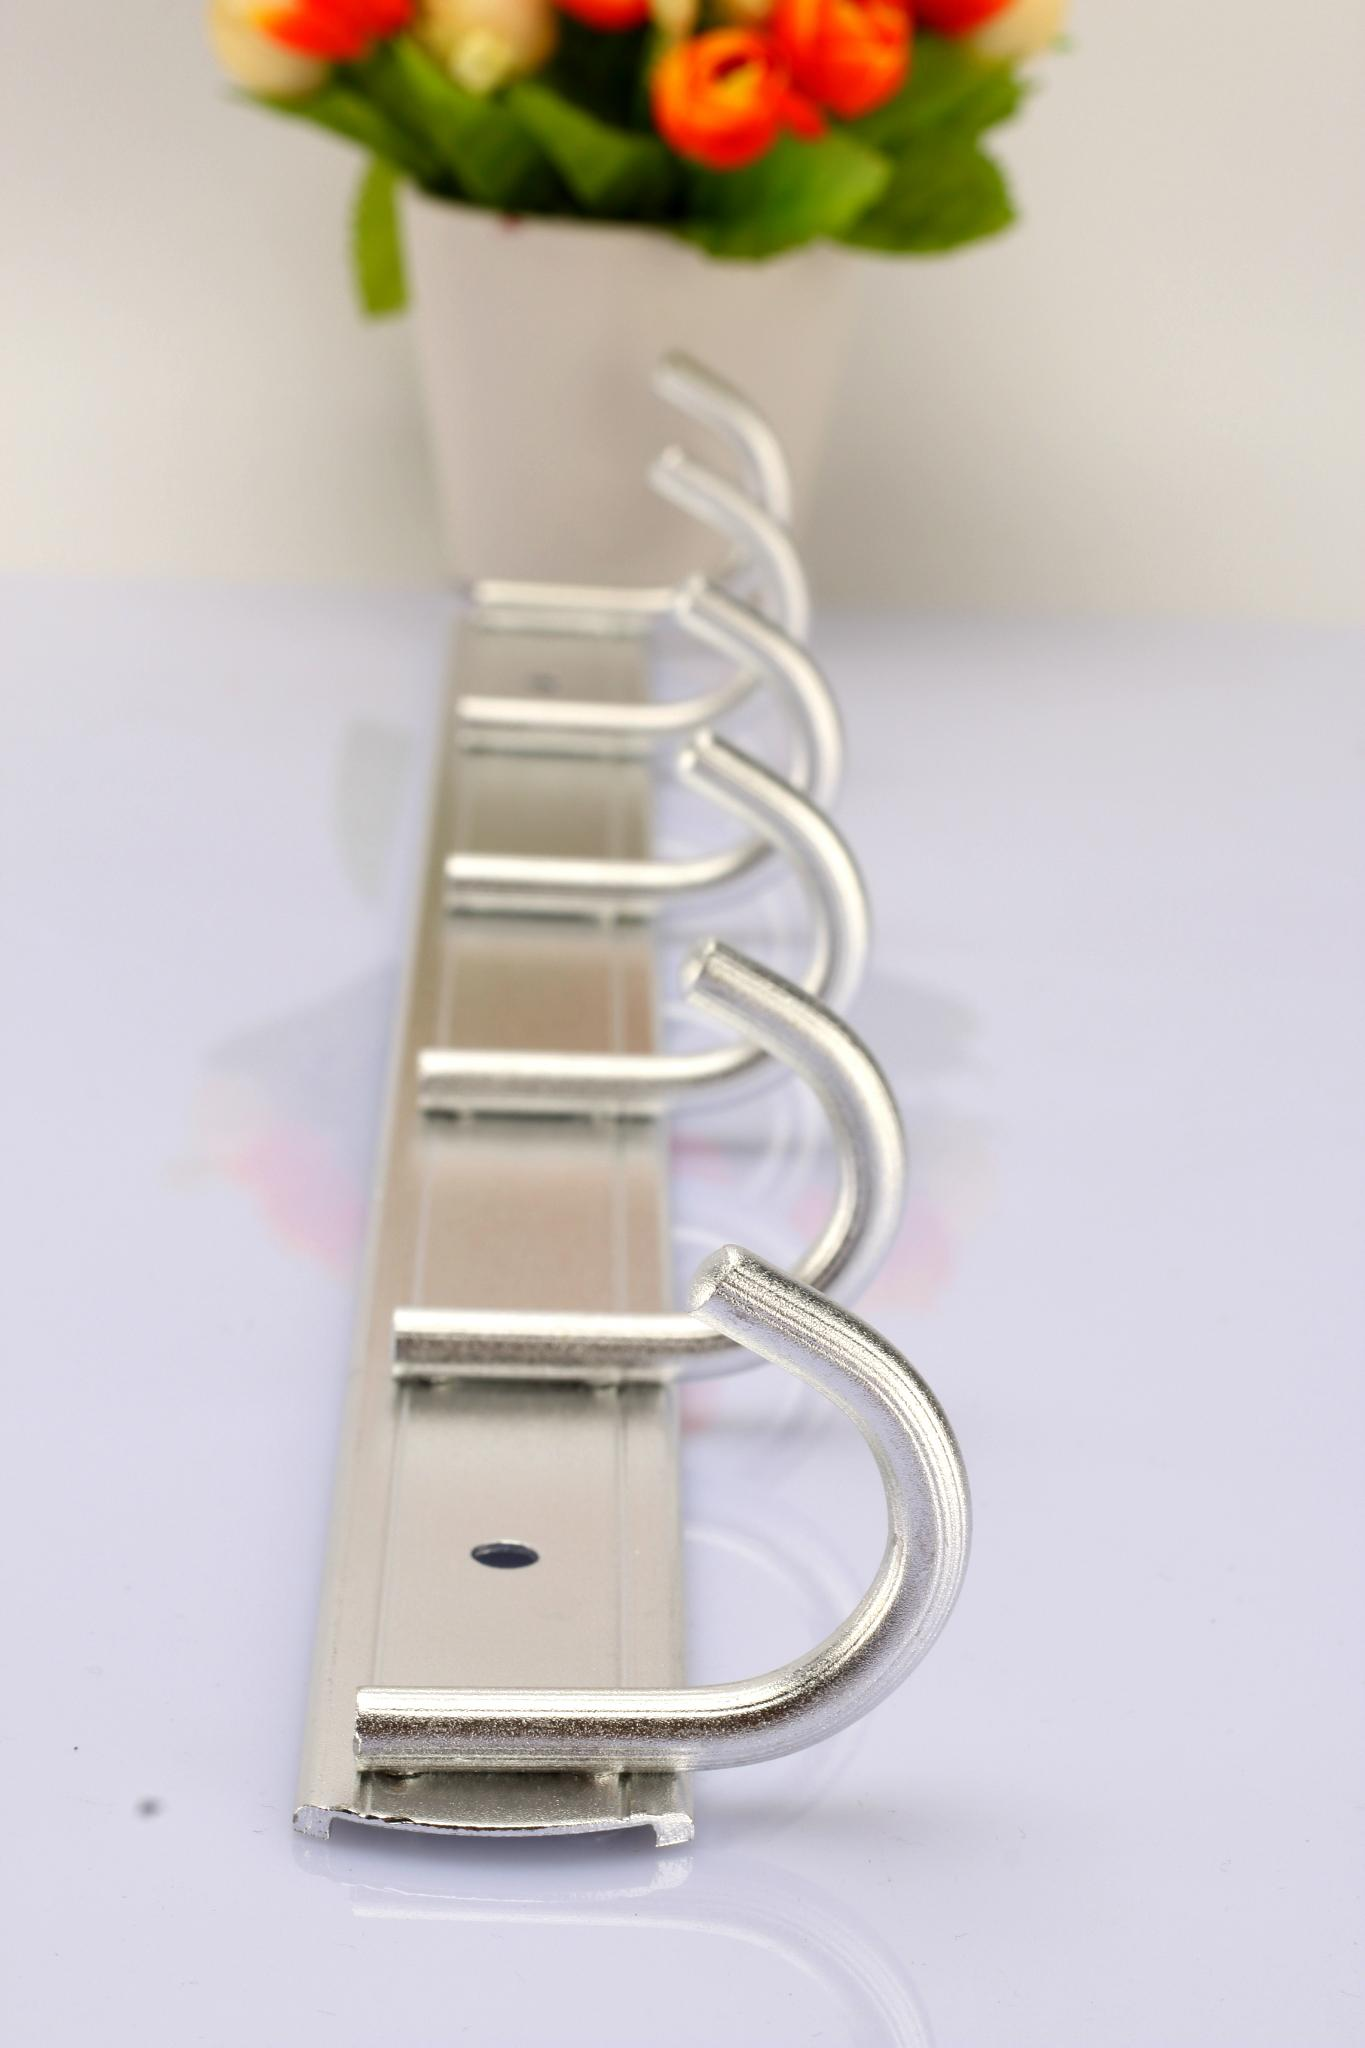 Factory direct space aluminum wall coat hook hook hook hook / practical towel 3